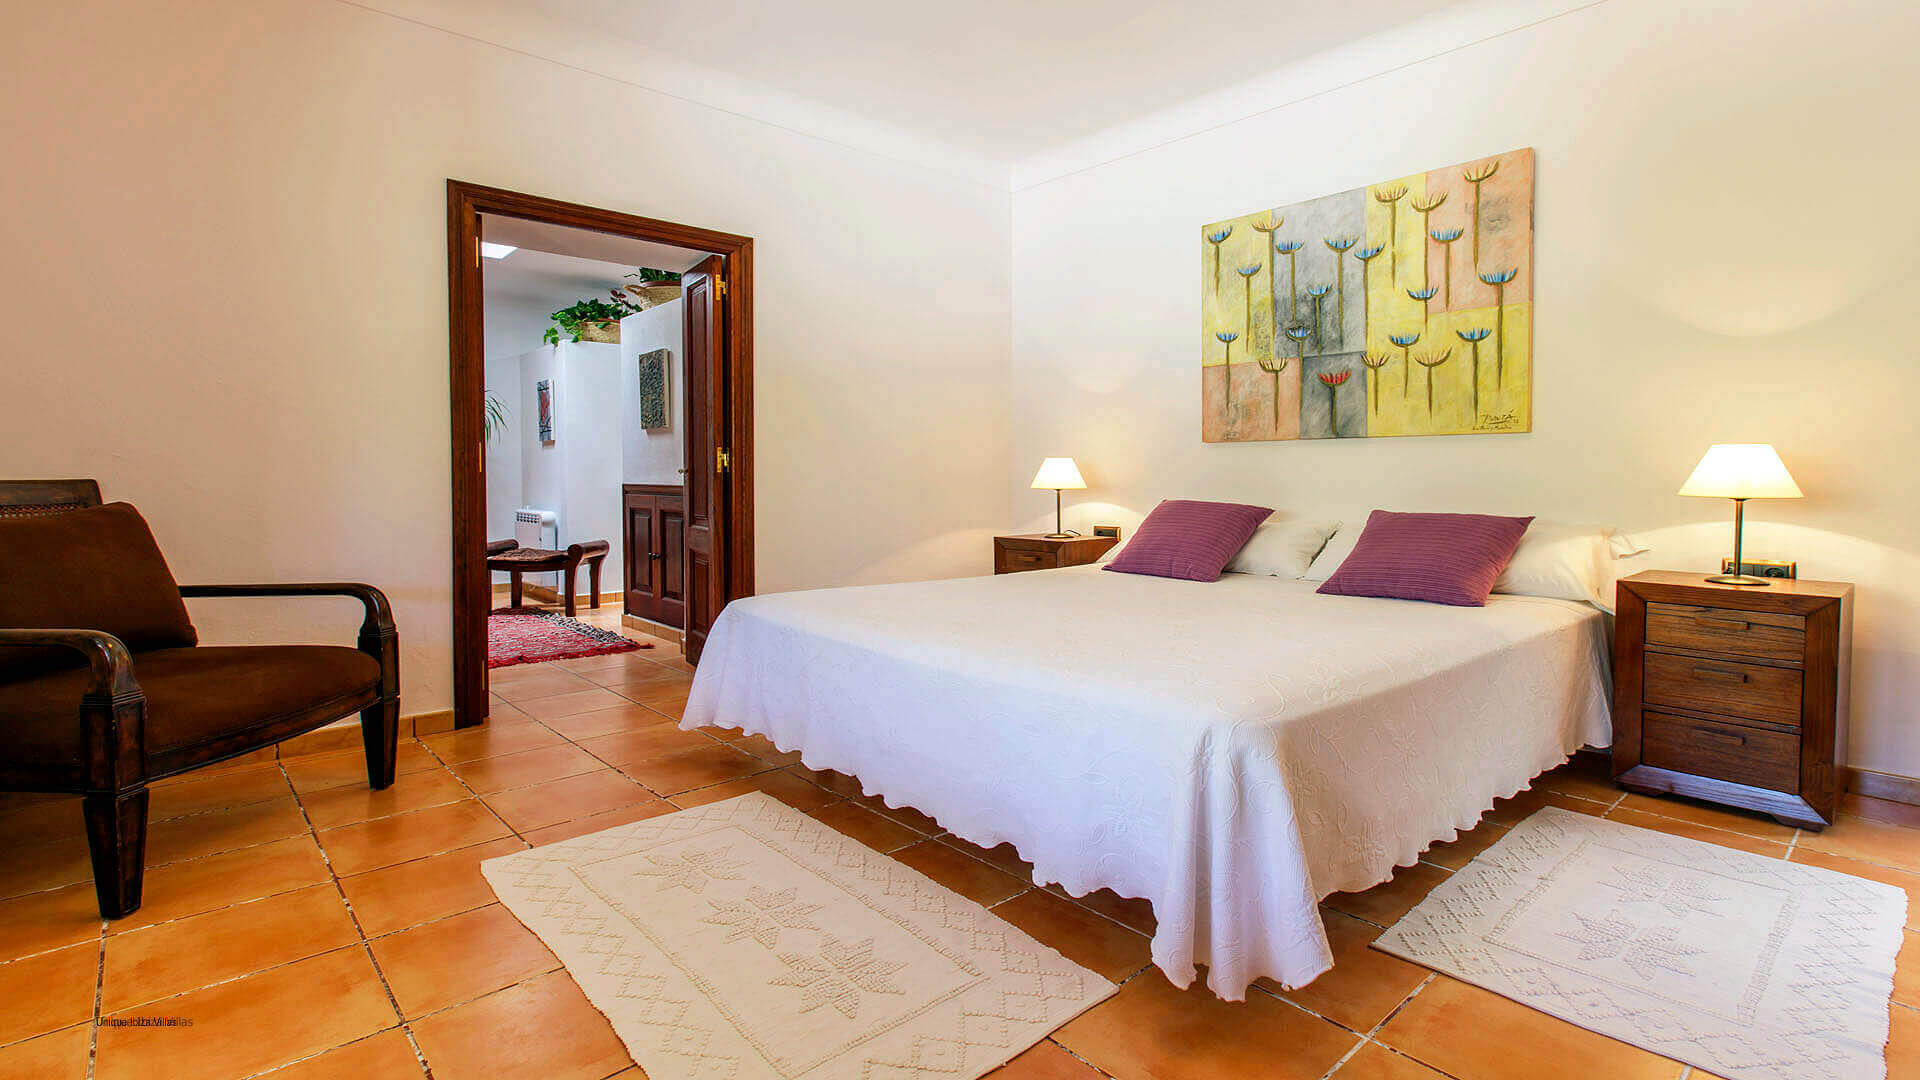 Casa La Vila Ibiza 44 Bedroom 1